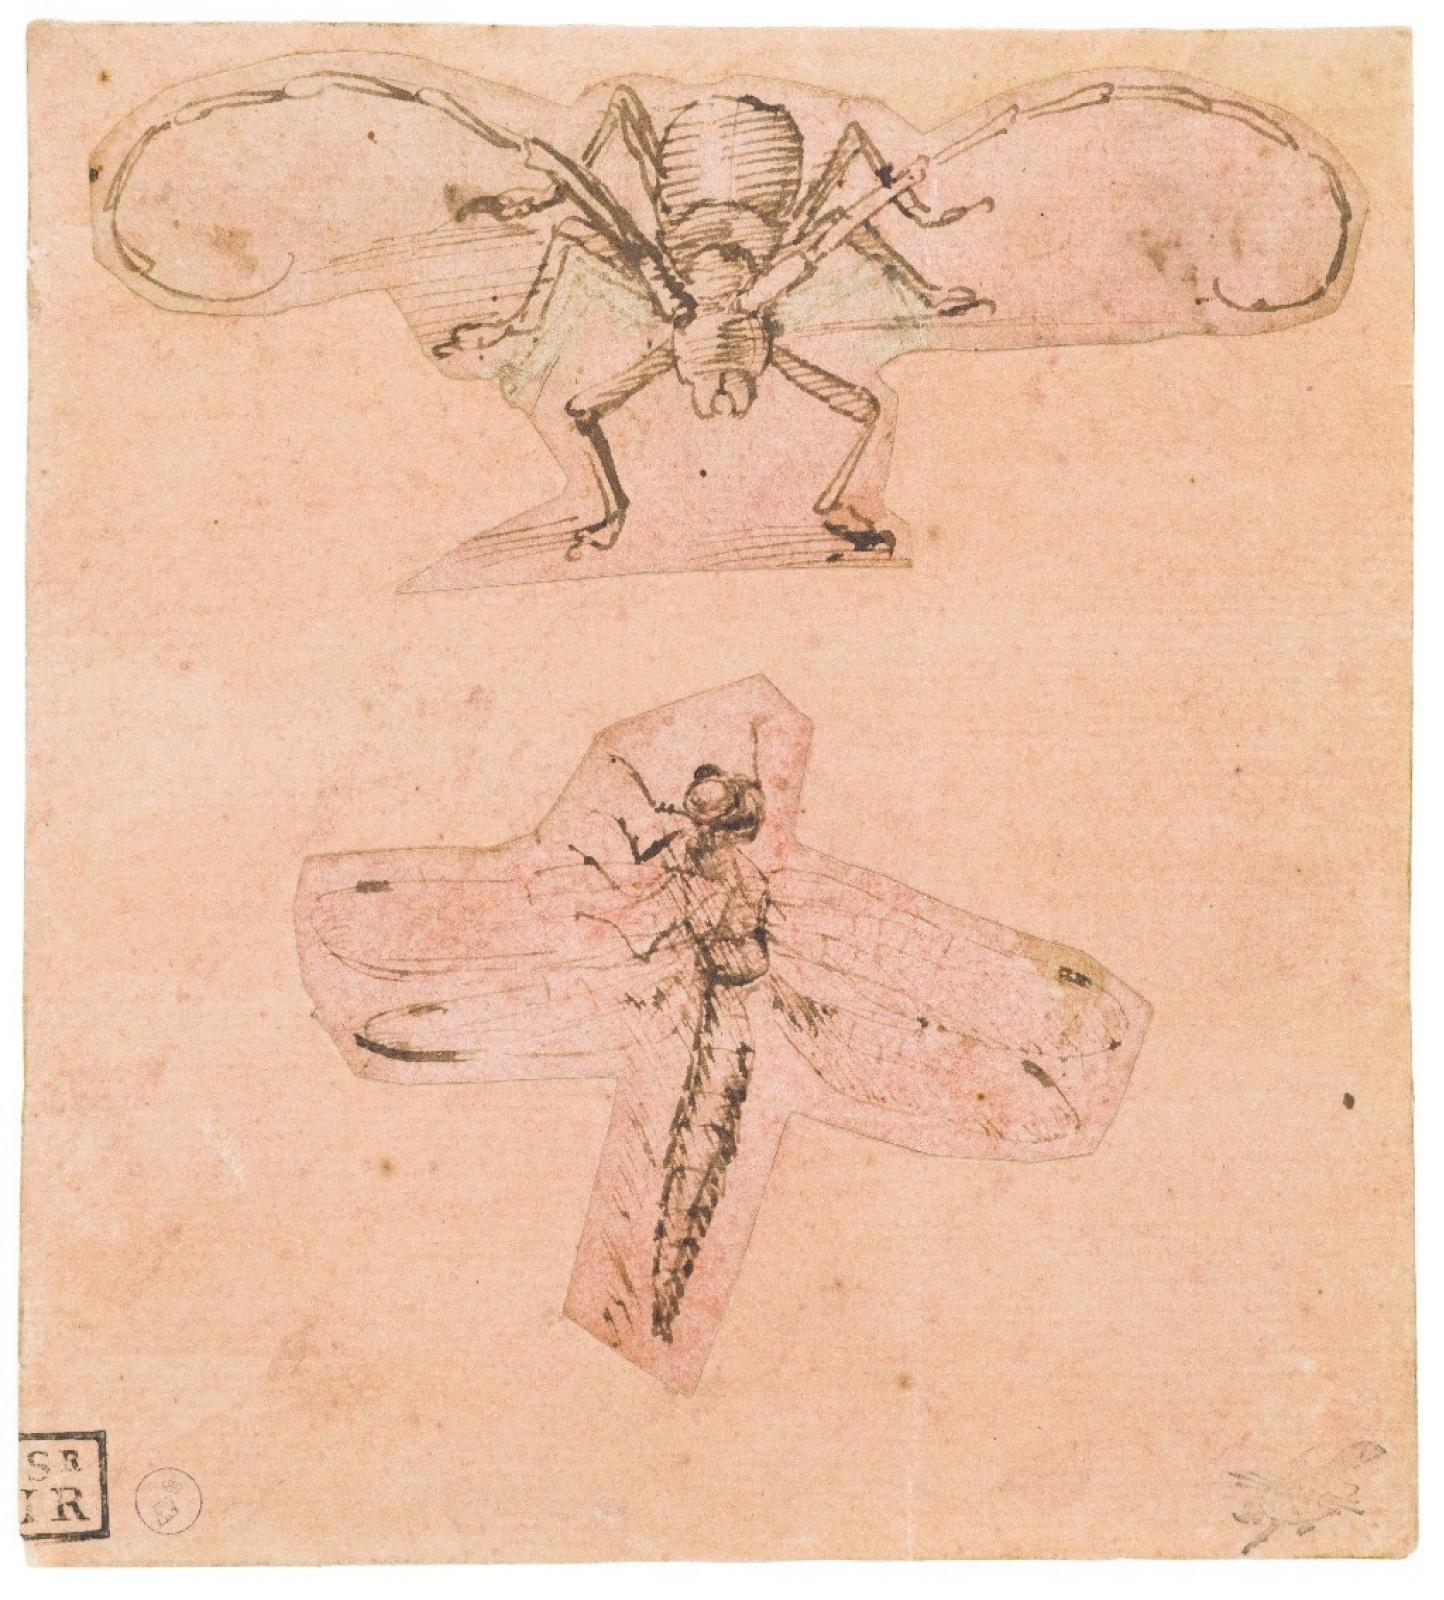 Леонардо да Винчи. Рисунок жука-усача и стрекозы